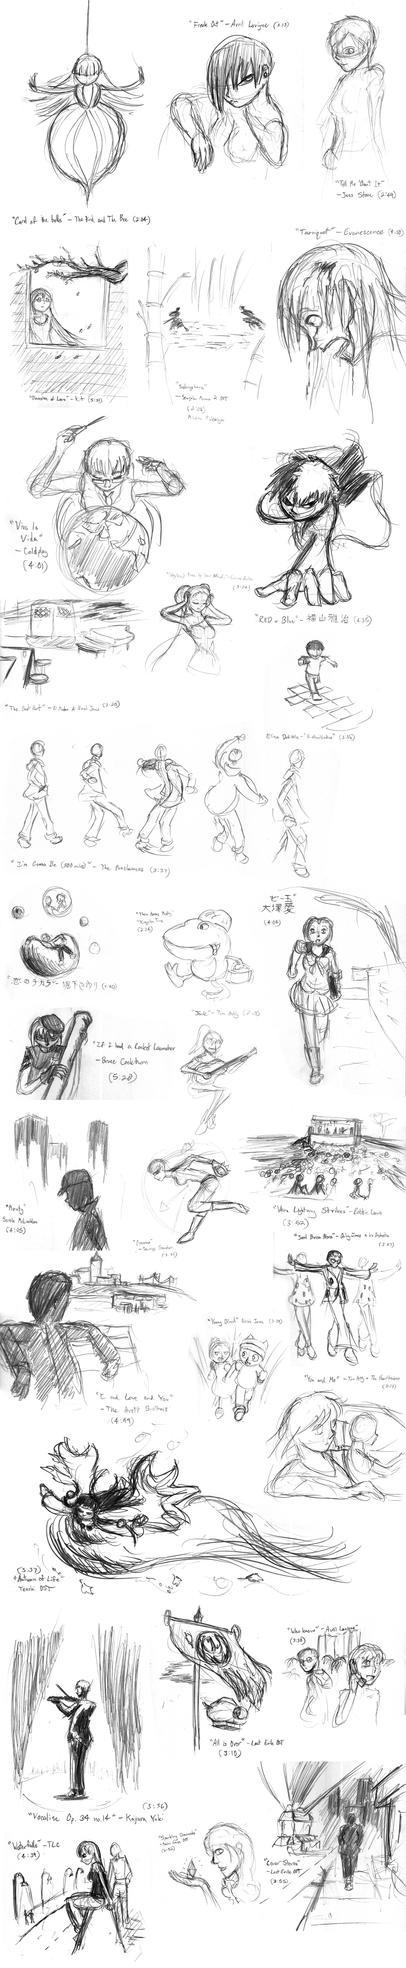 Musical Sketchdump by wandering-ronin